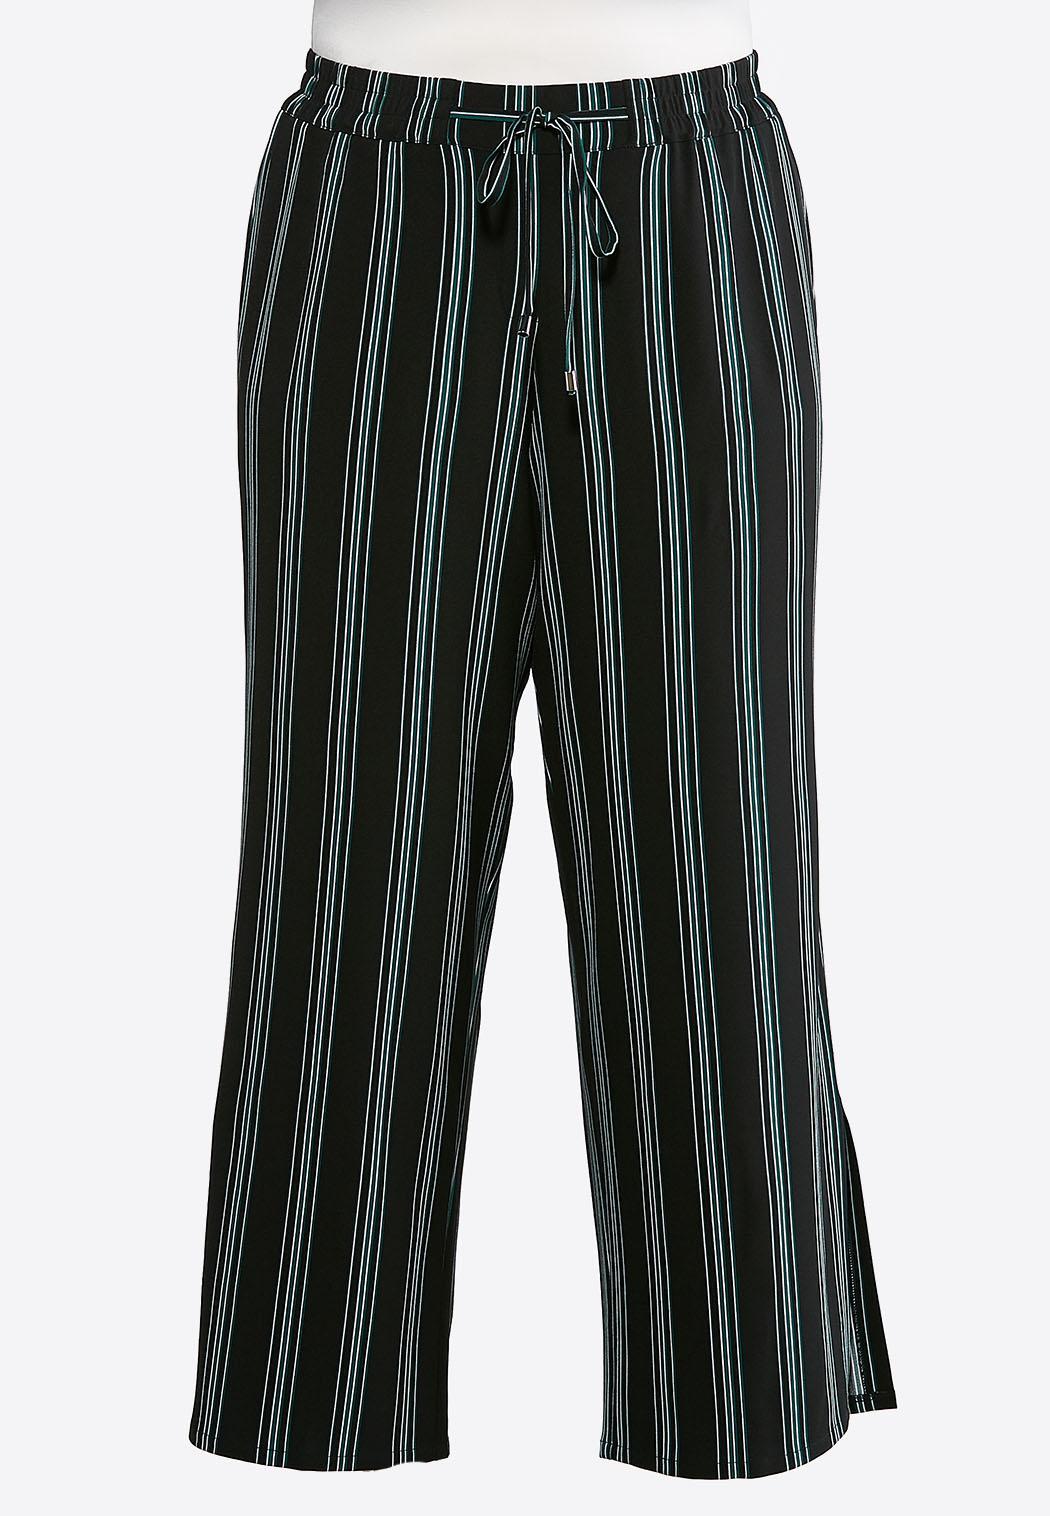 df9fde36fe2d45 Plus Size Stripe Tie Front Palazzo Pants Wide Leg Cato Fashions